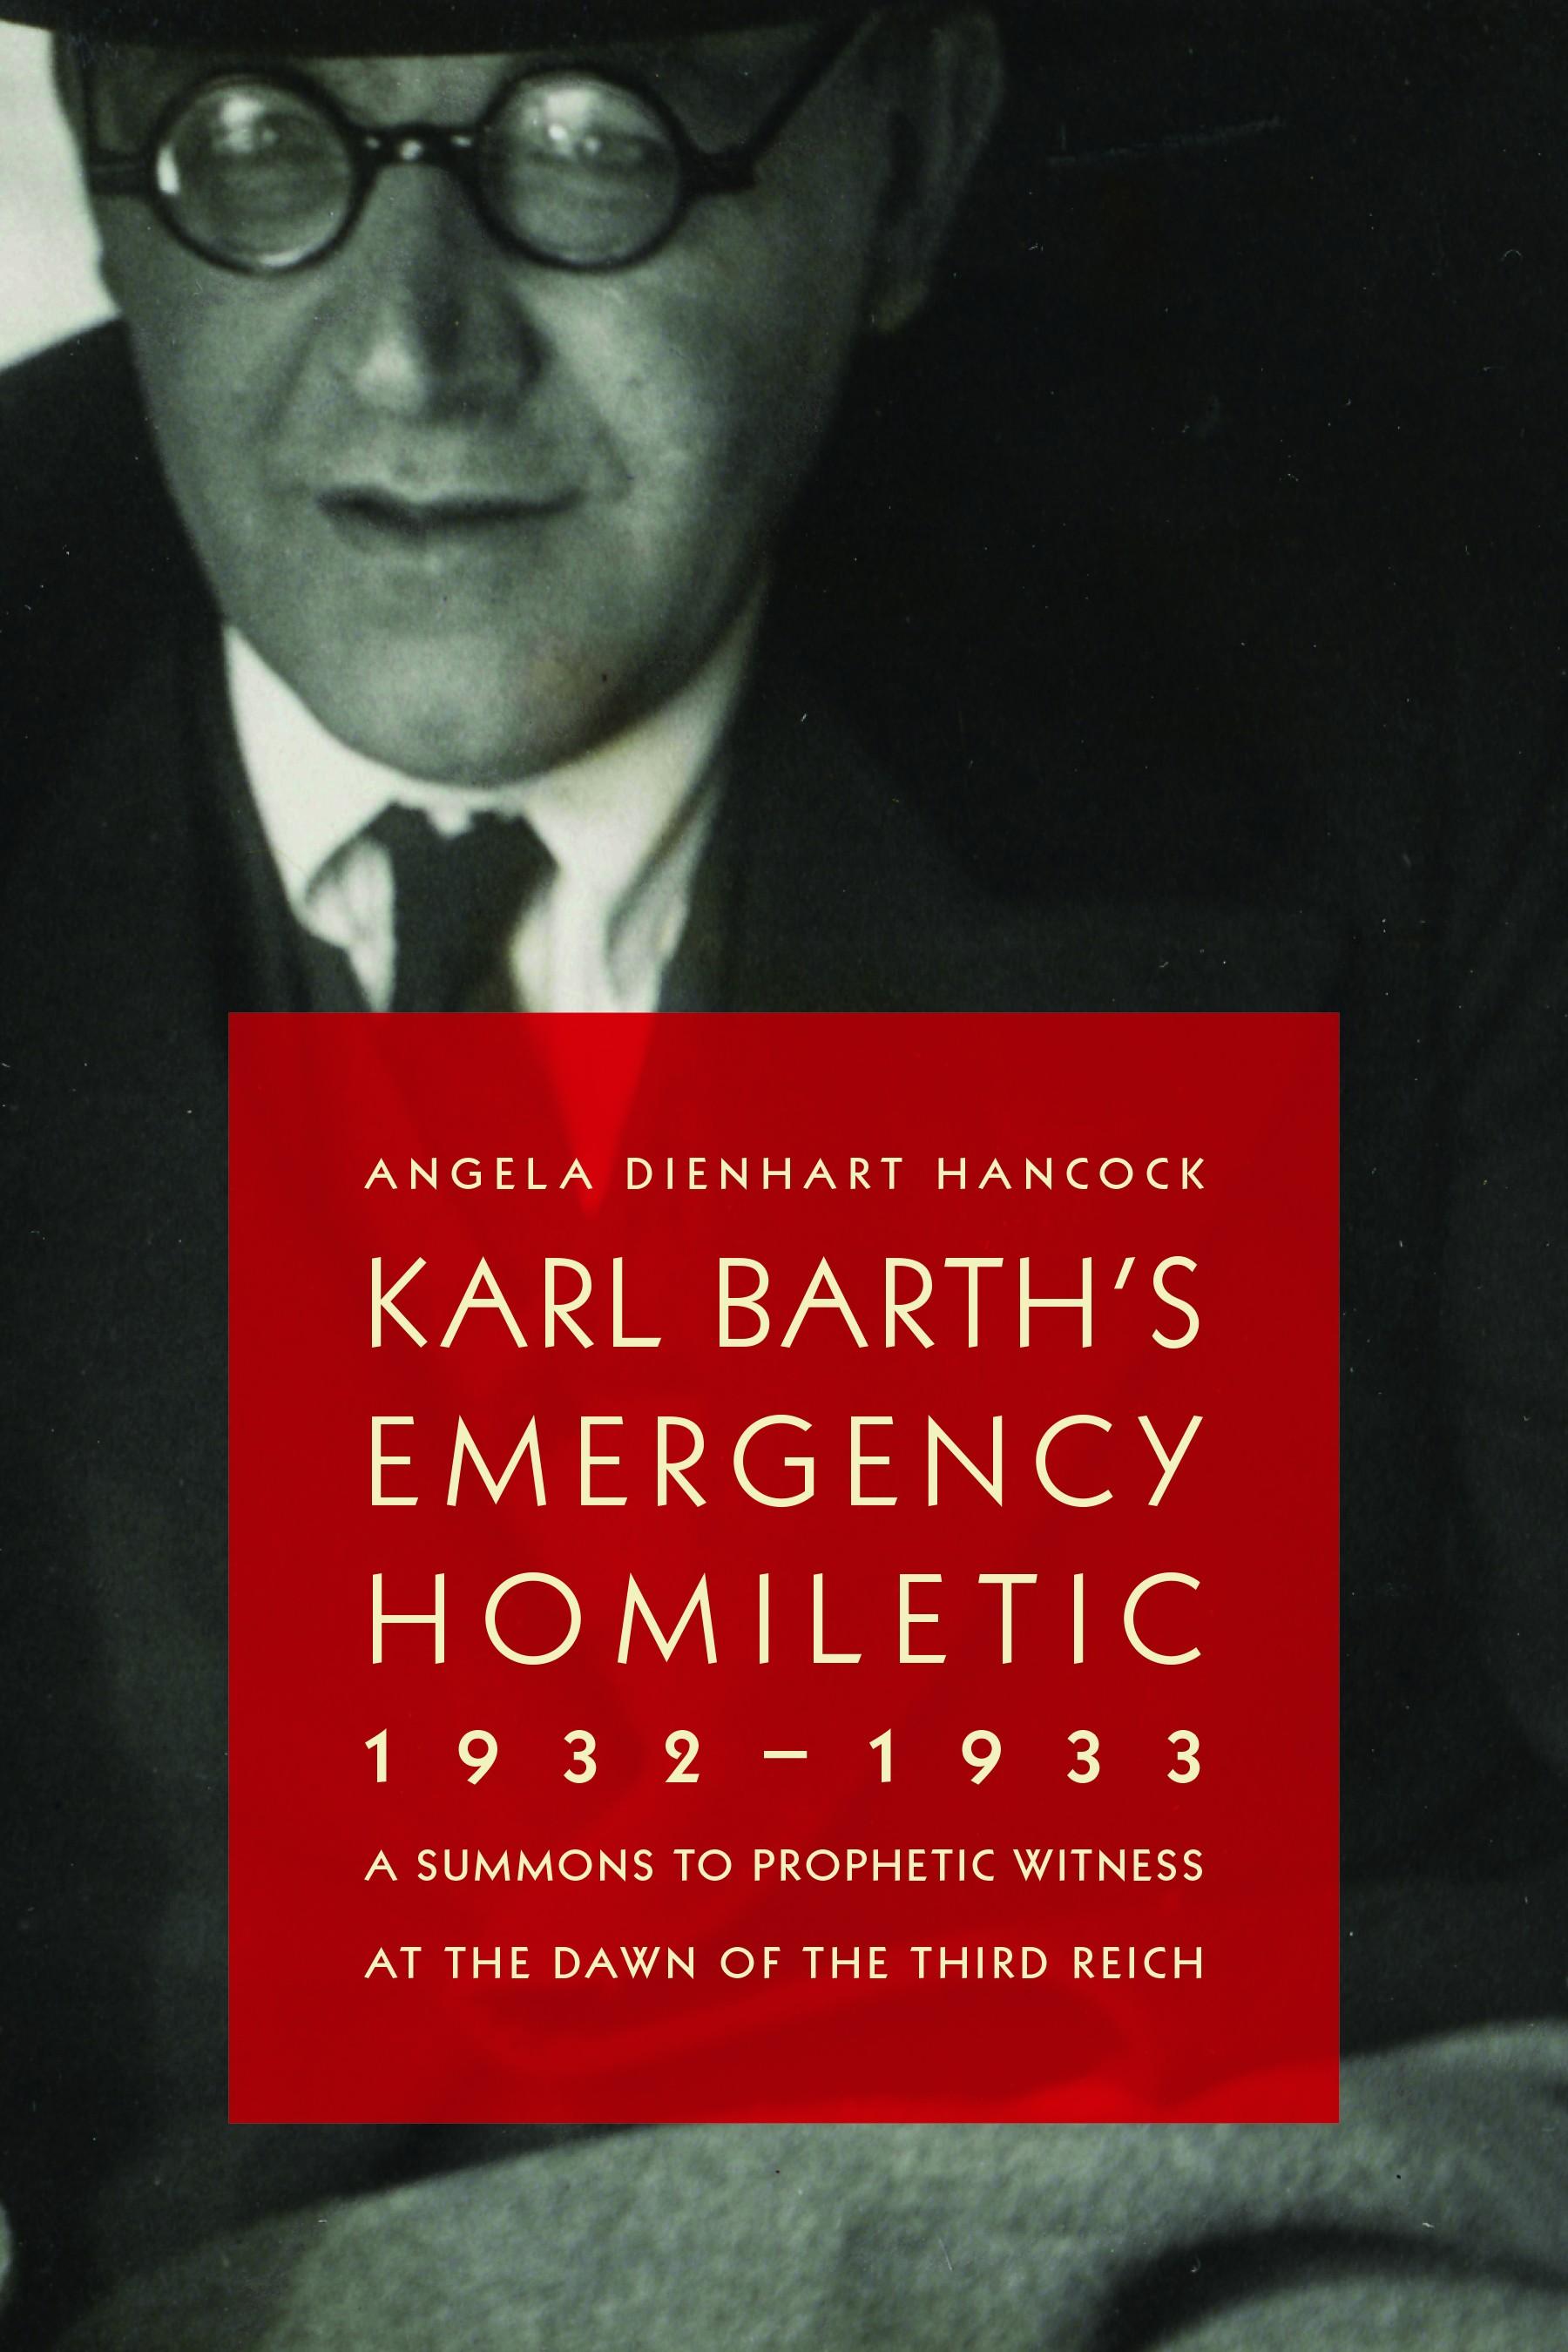 Karl Barth's Emergency Homiletic